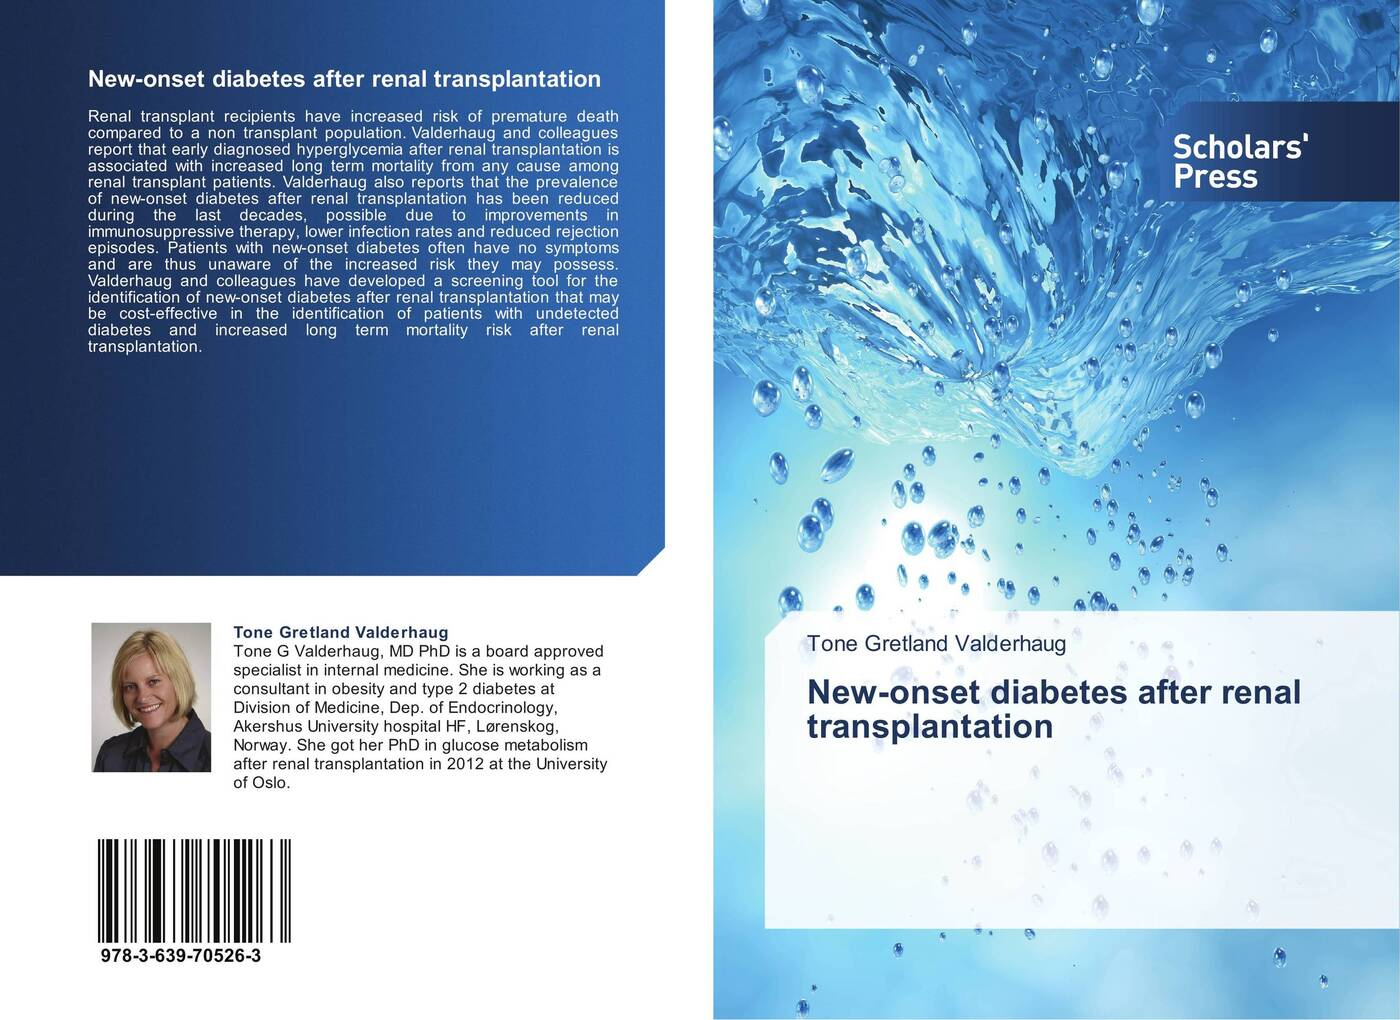 Tone Gretland Valderhaug New-onset diabetes after renal transplantation